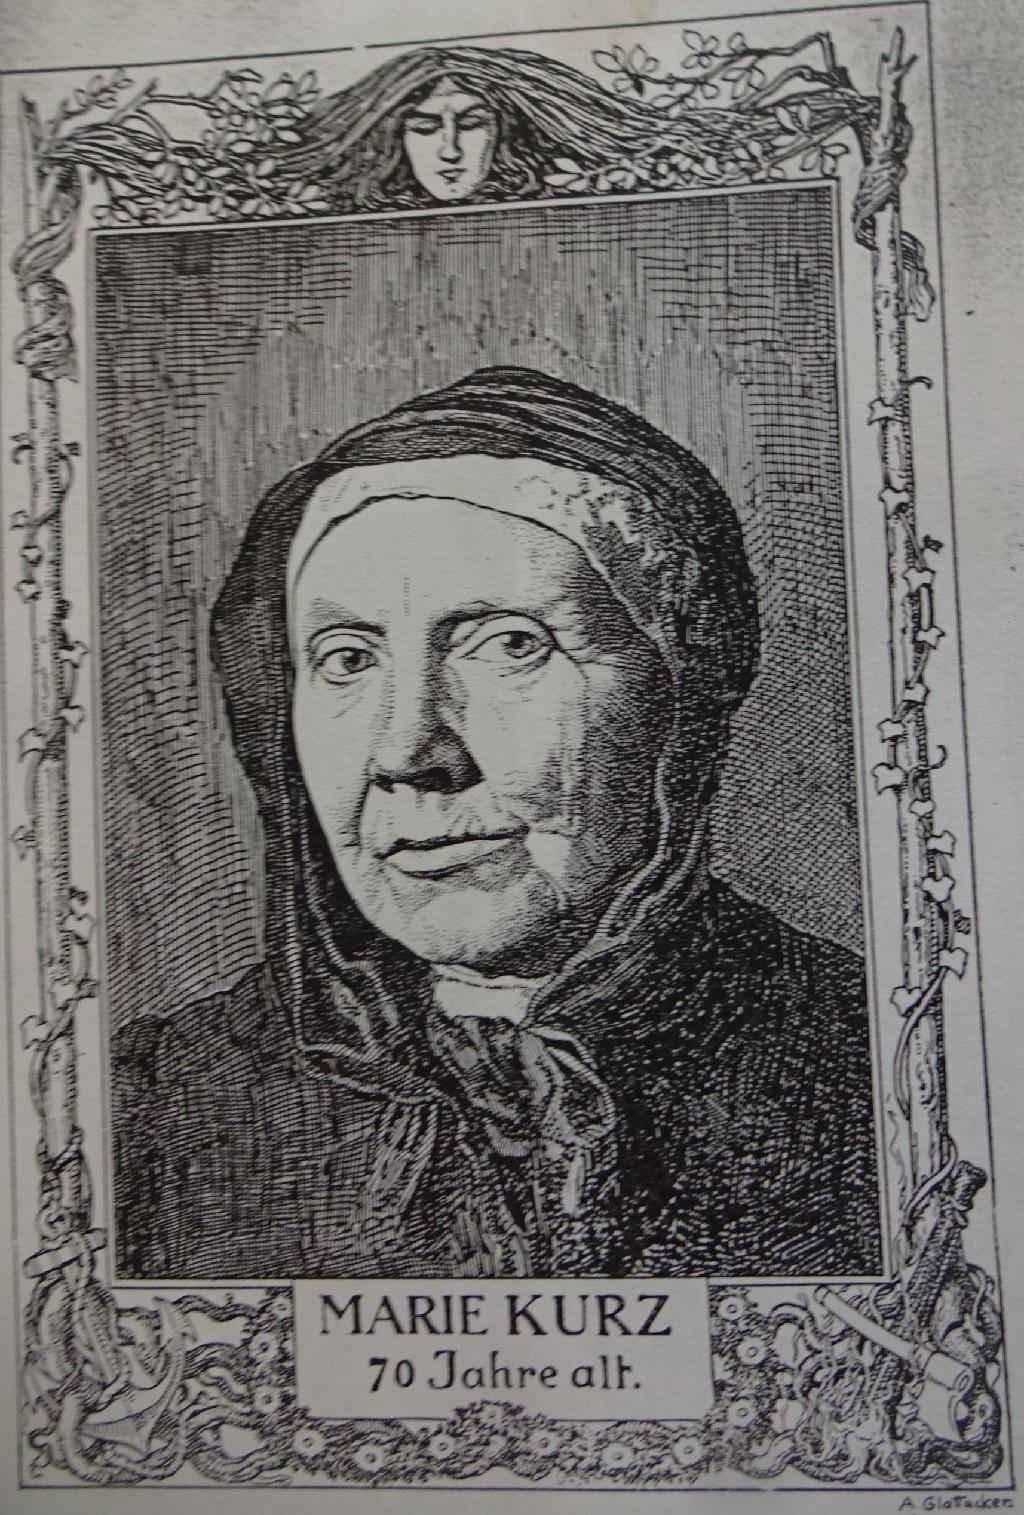 Marie Kurz